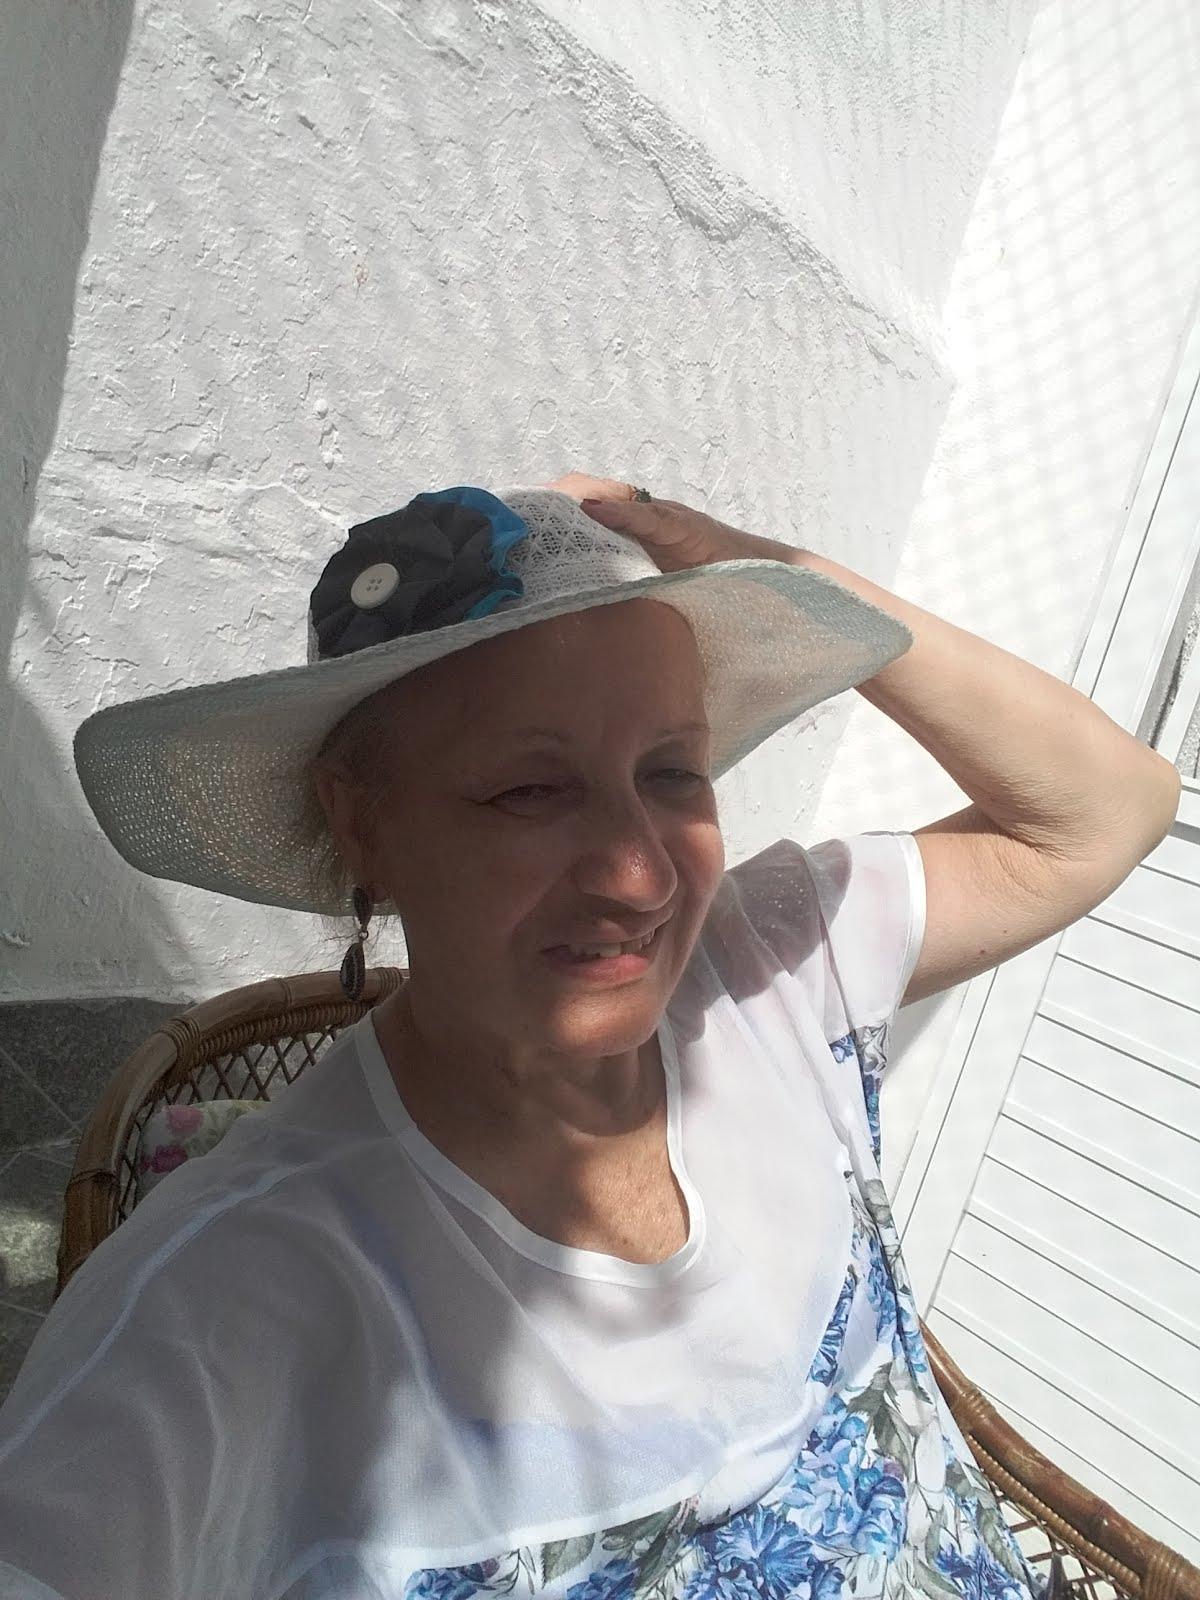 Banho de sol 10 de setembro 2019